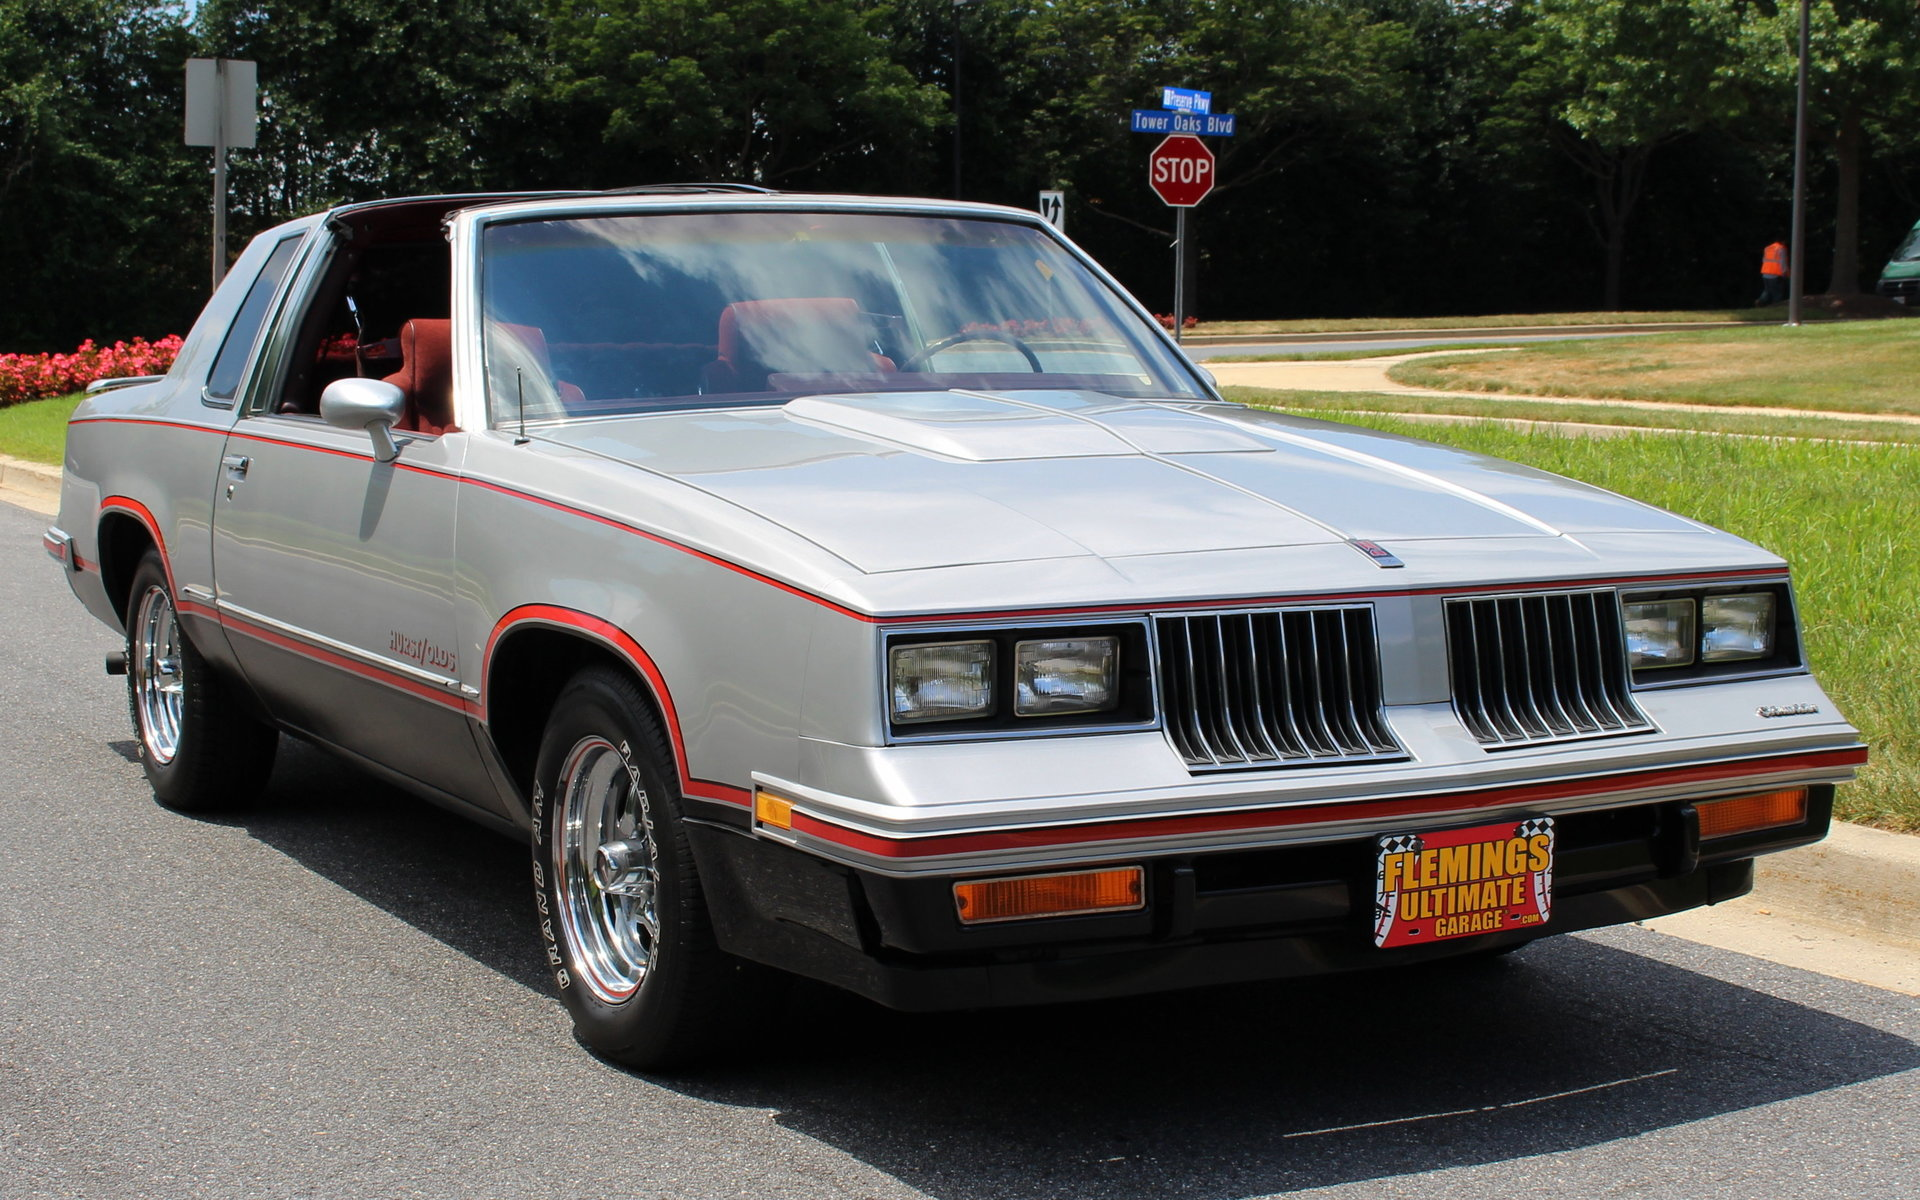 1984 Oldsmobile 442 HurstOlds For Sale 77522 MCG